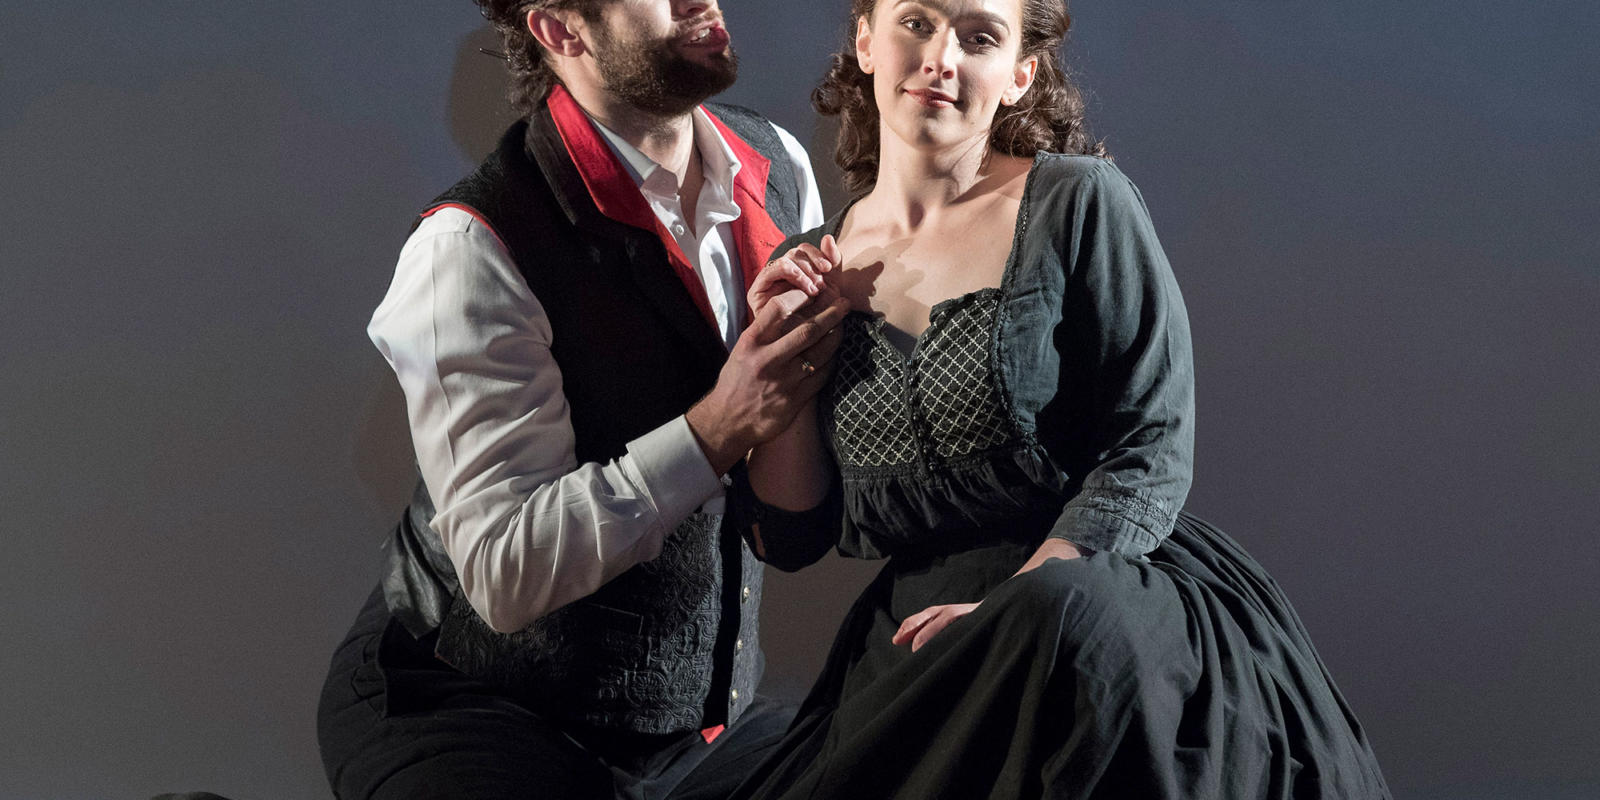 ENO 17/18: The Marriage of Figaro Ashley Riches Rhian Lois (c) Alastair Muir